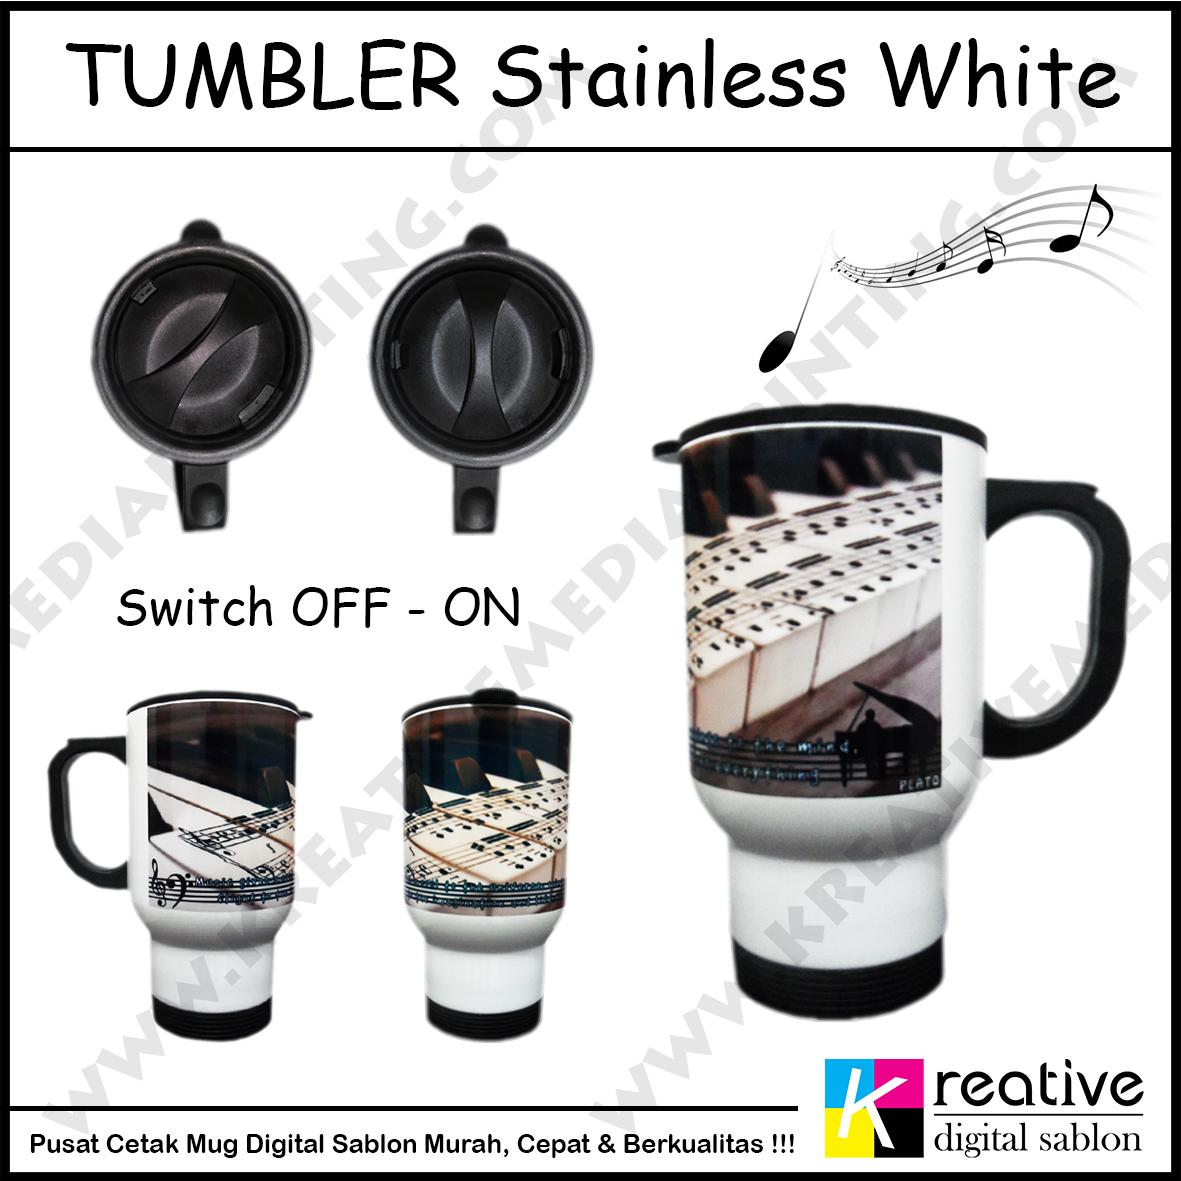 Cetak Tumbler Stainless White